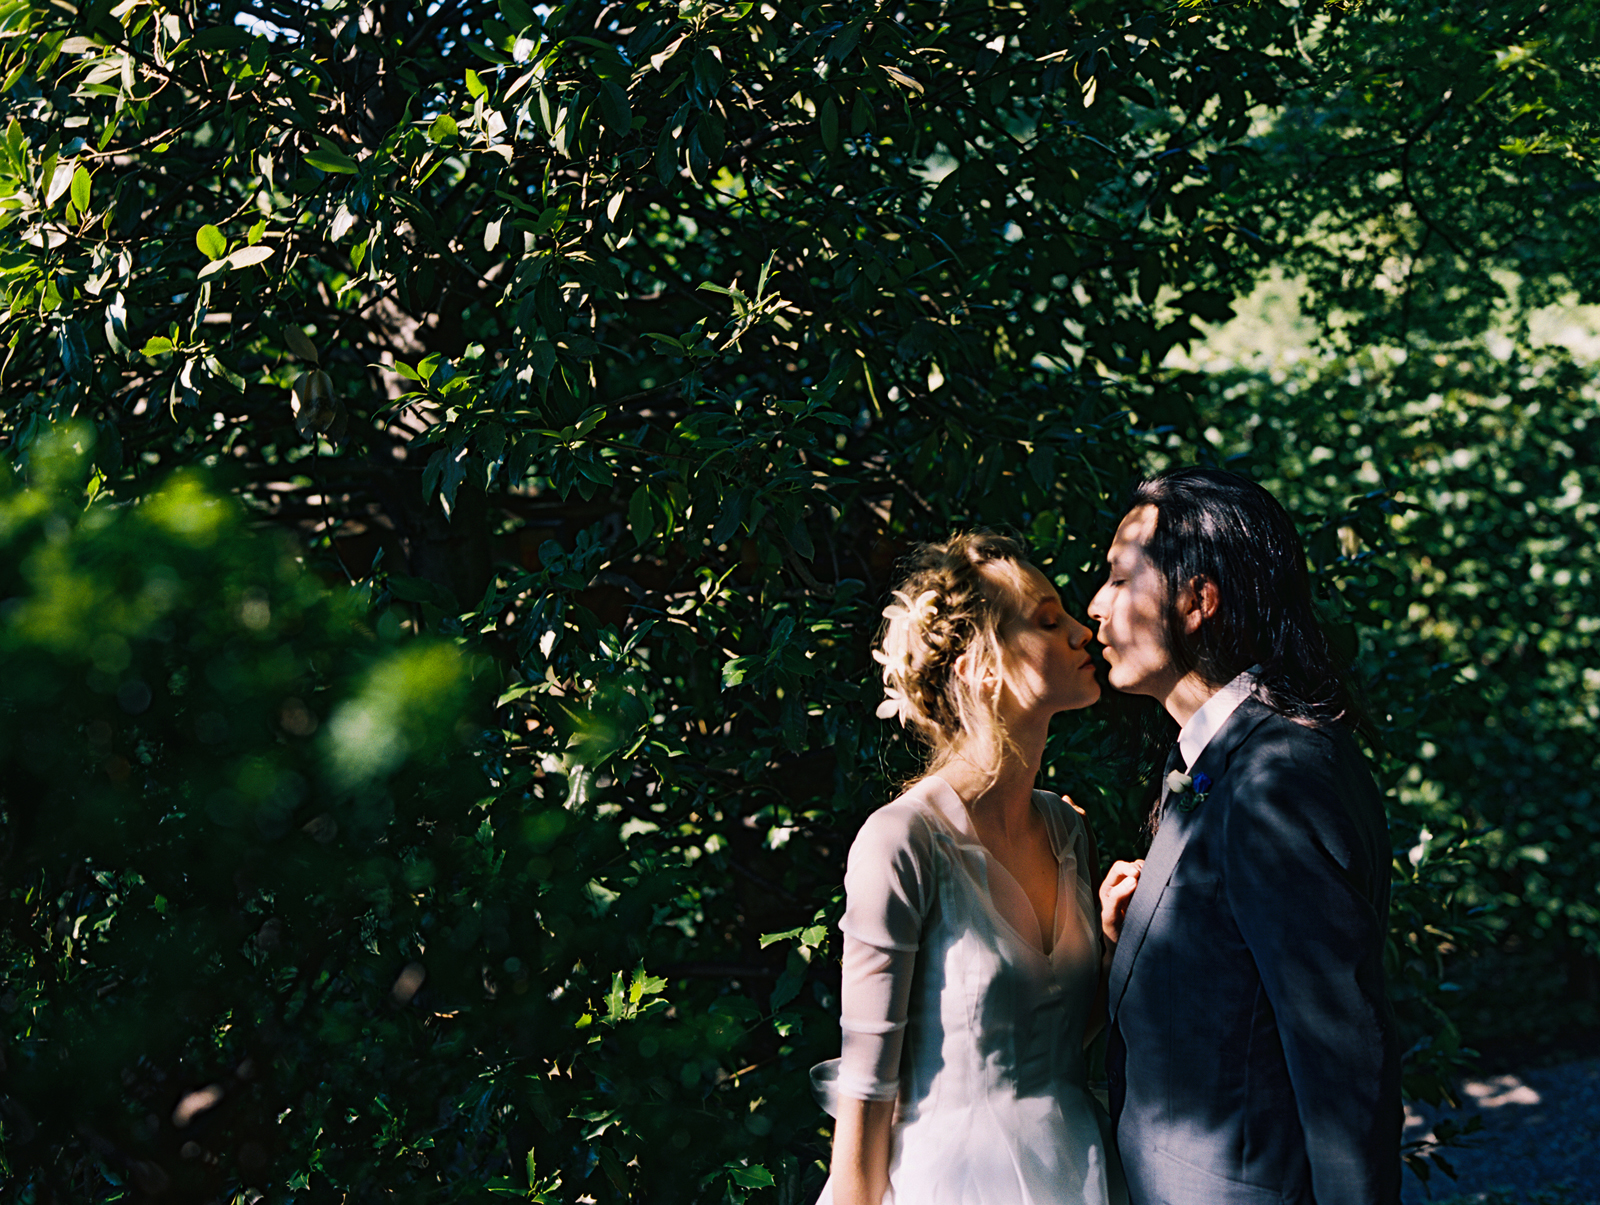 best_wedding_photographer_014.jpg